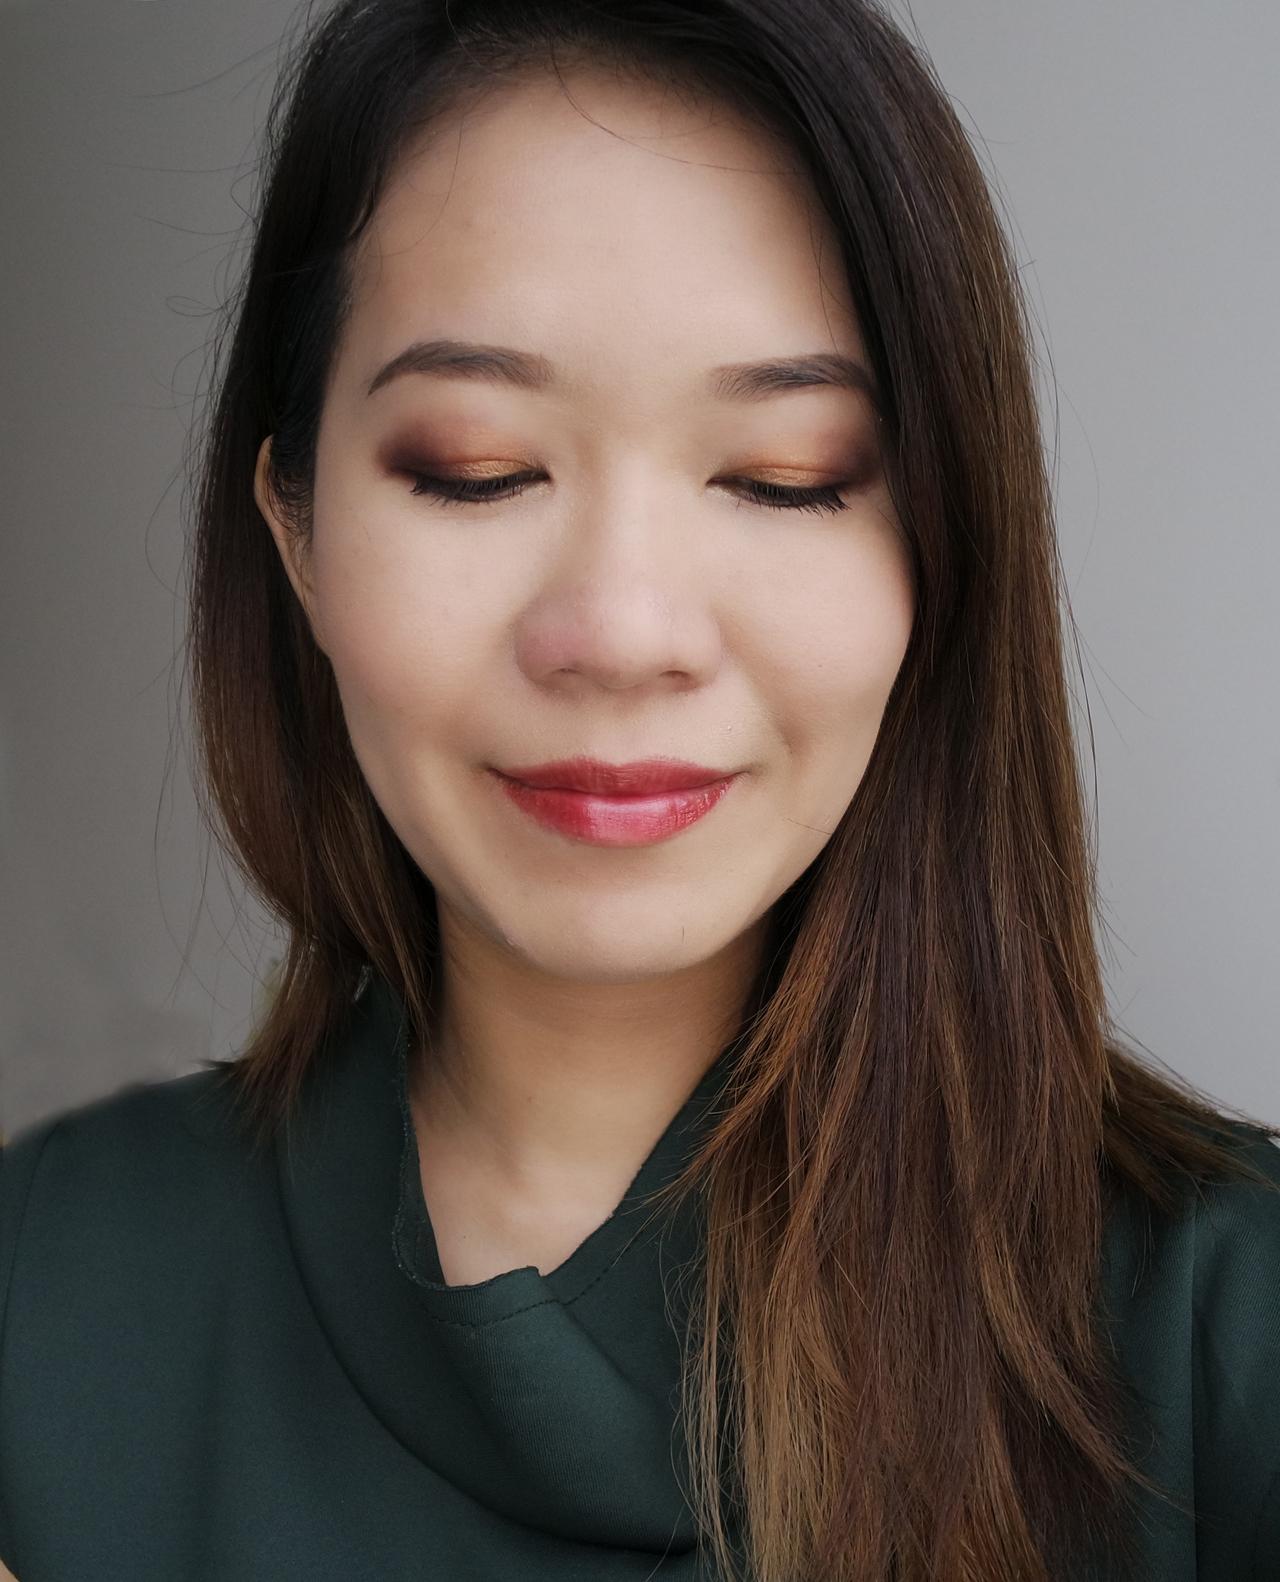 Takashi Murakami for Shu Uemura Cosmic Blossom Collection makeup look